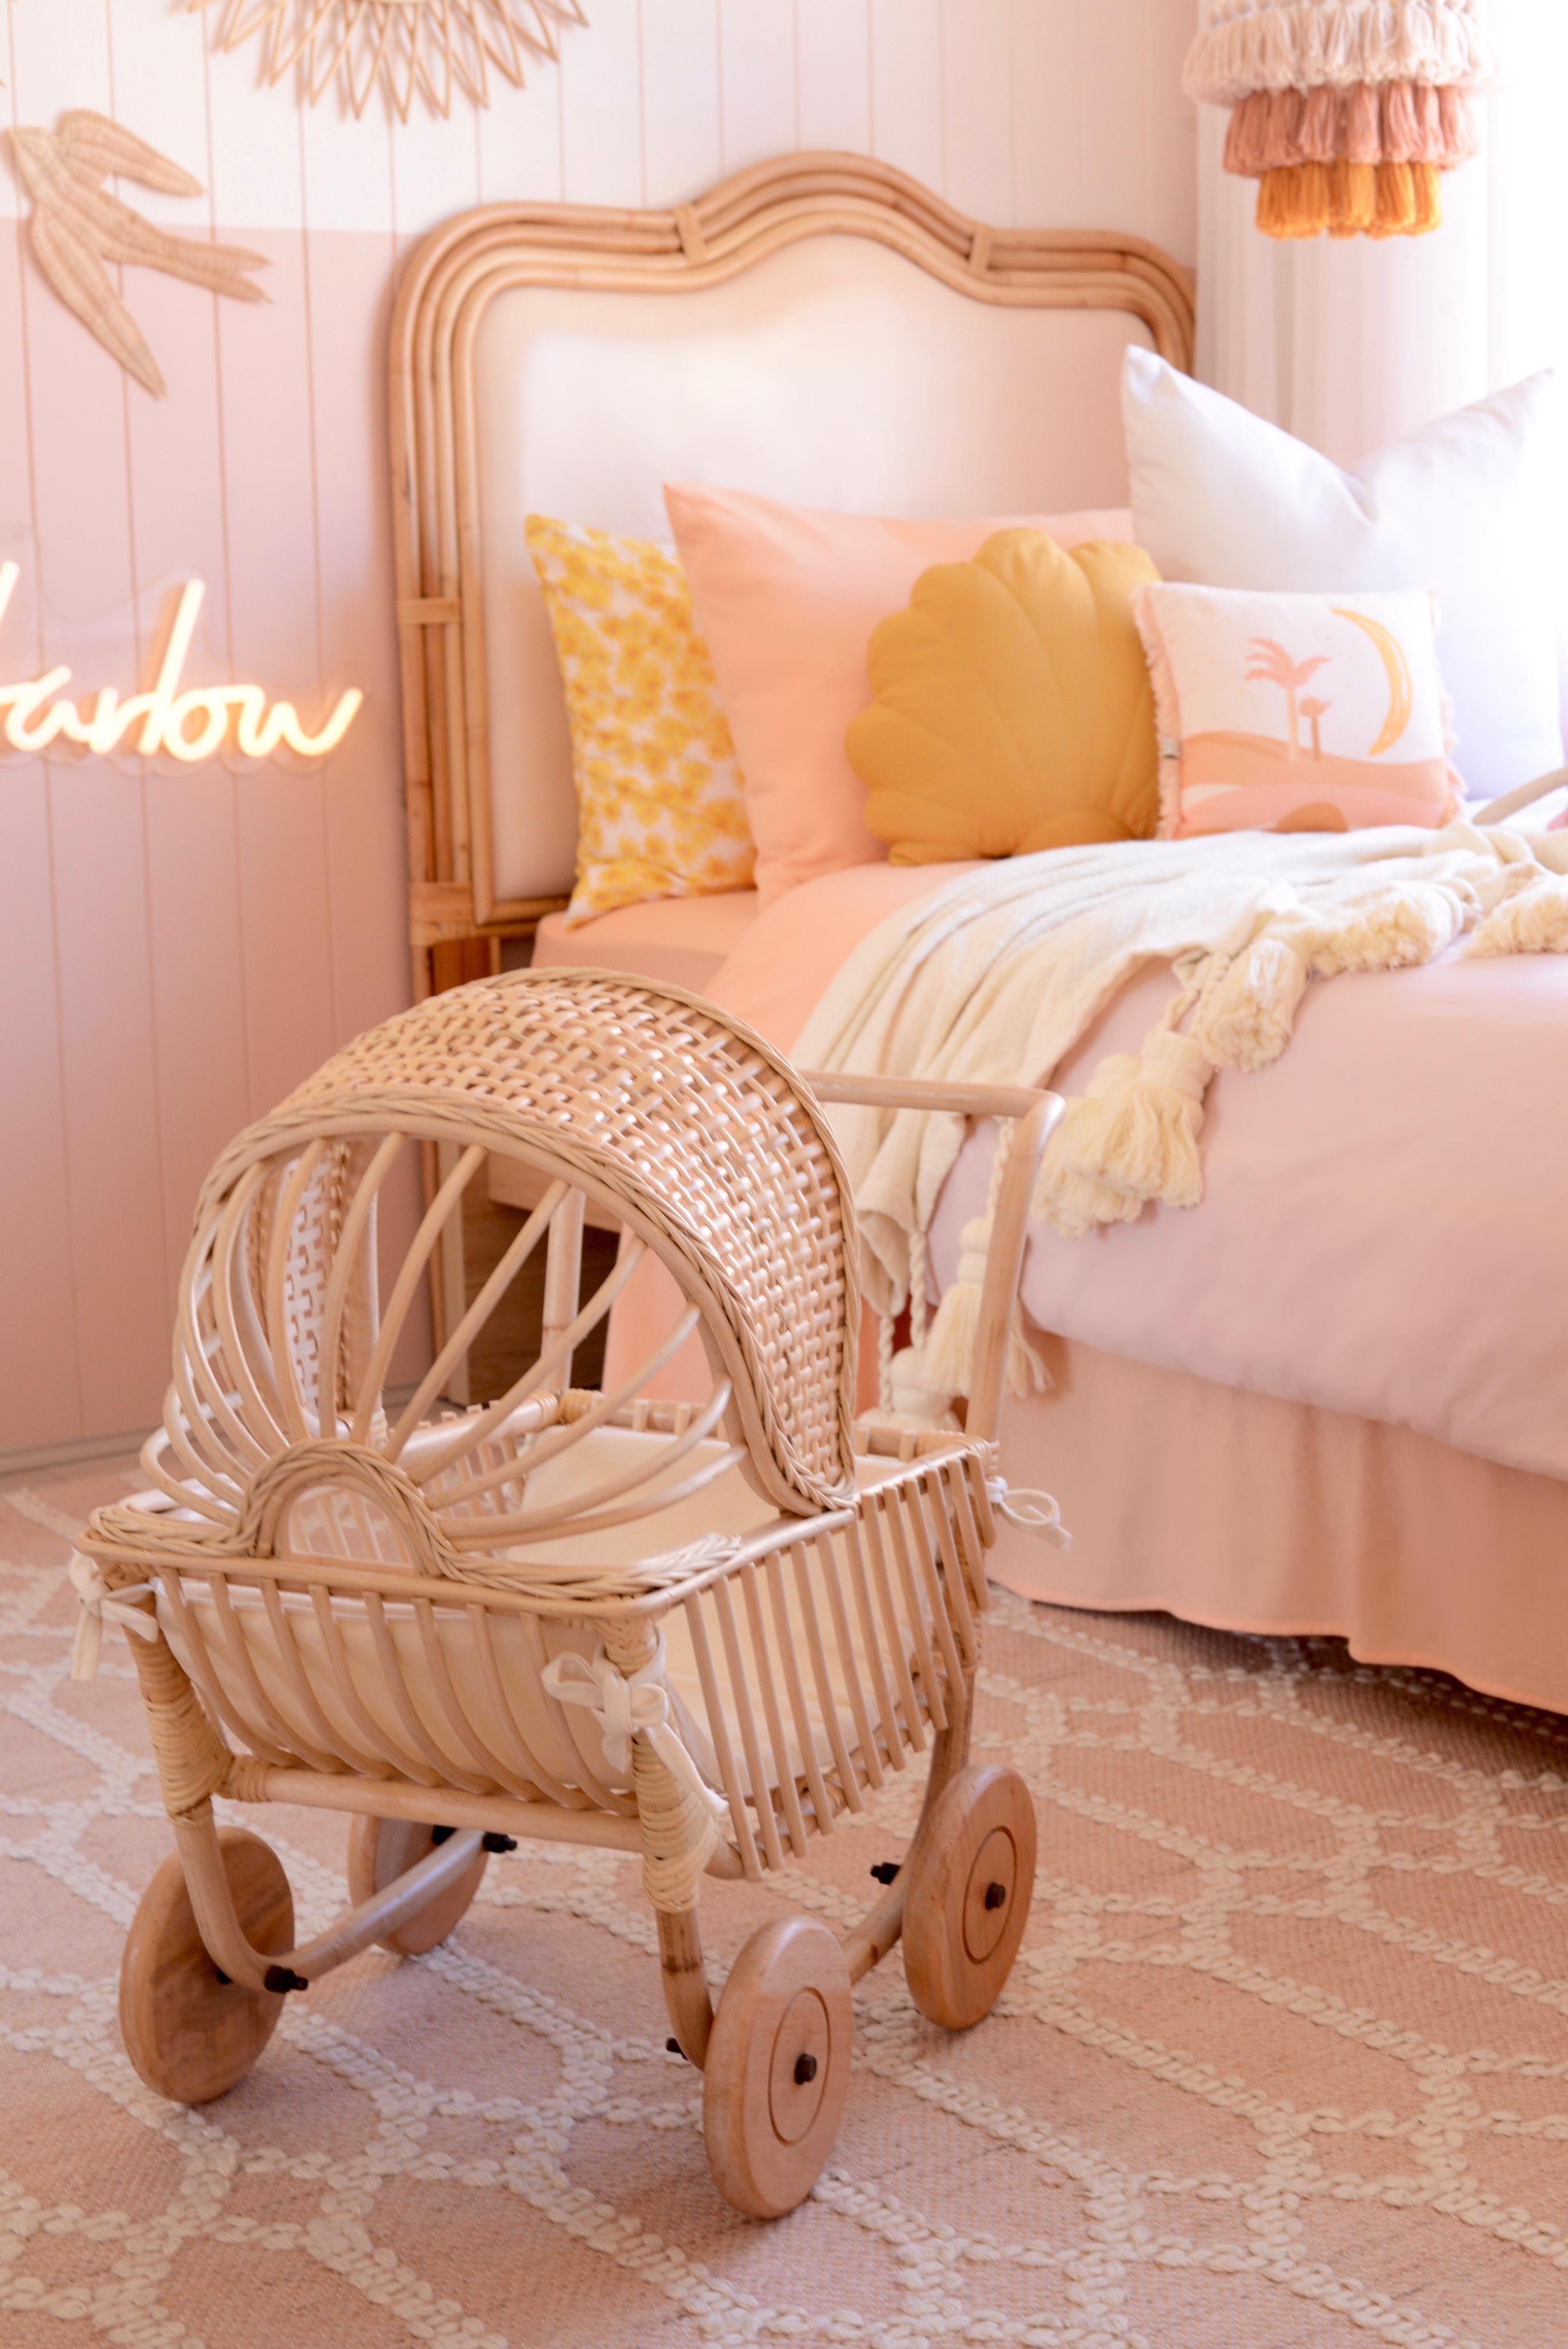 Harlows bedroom 2